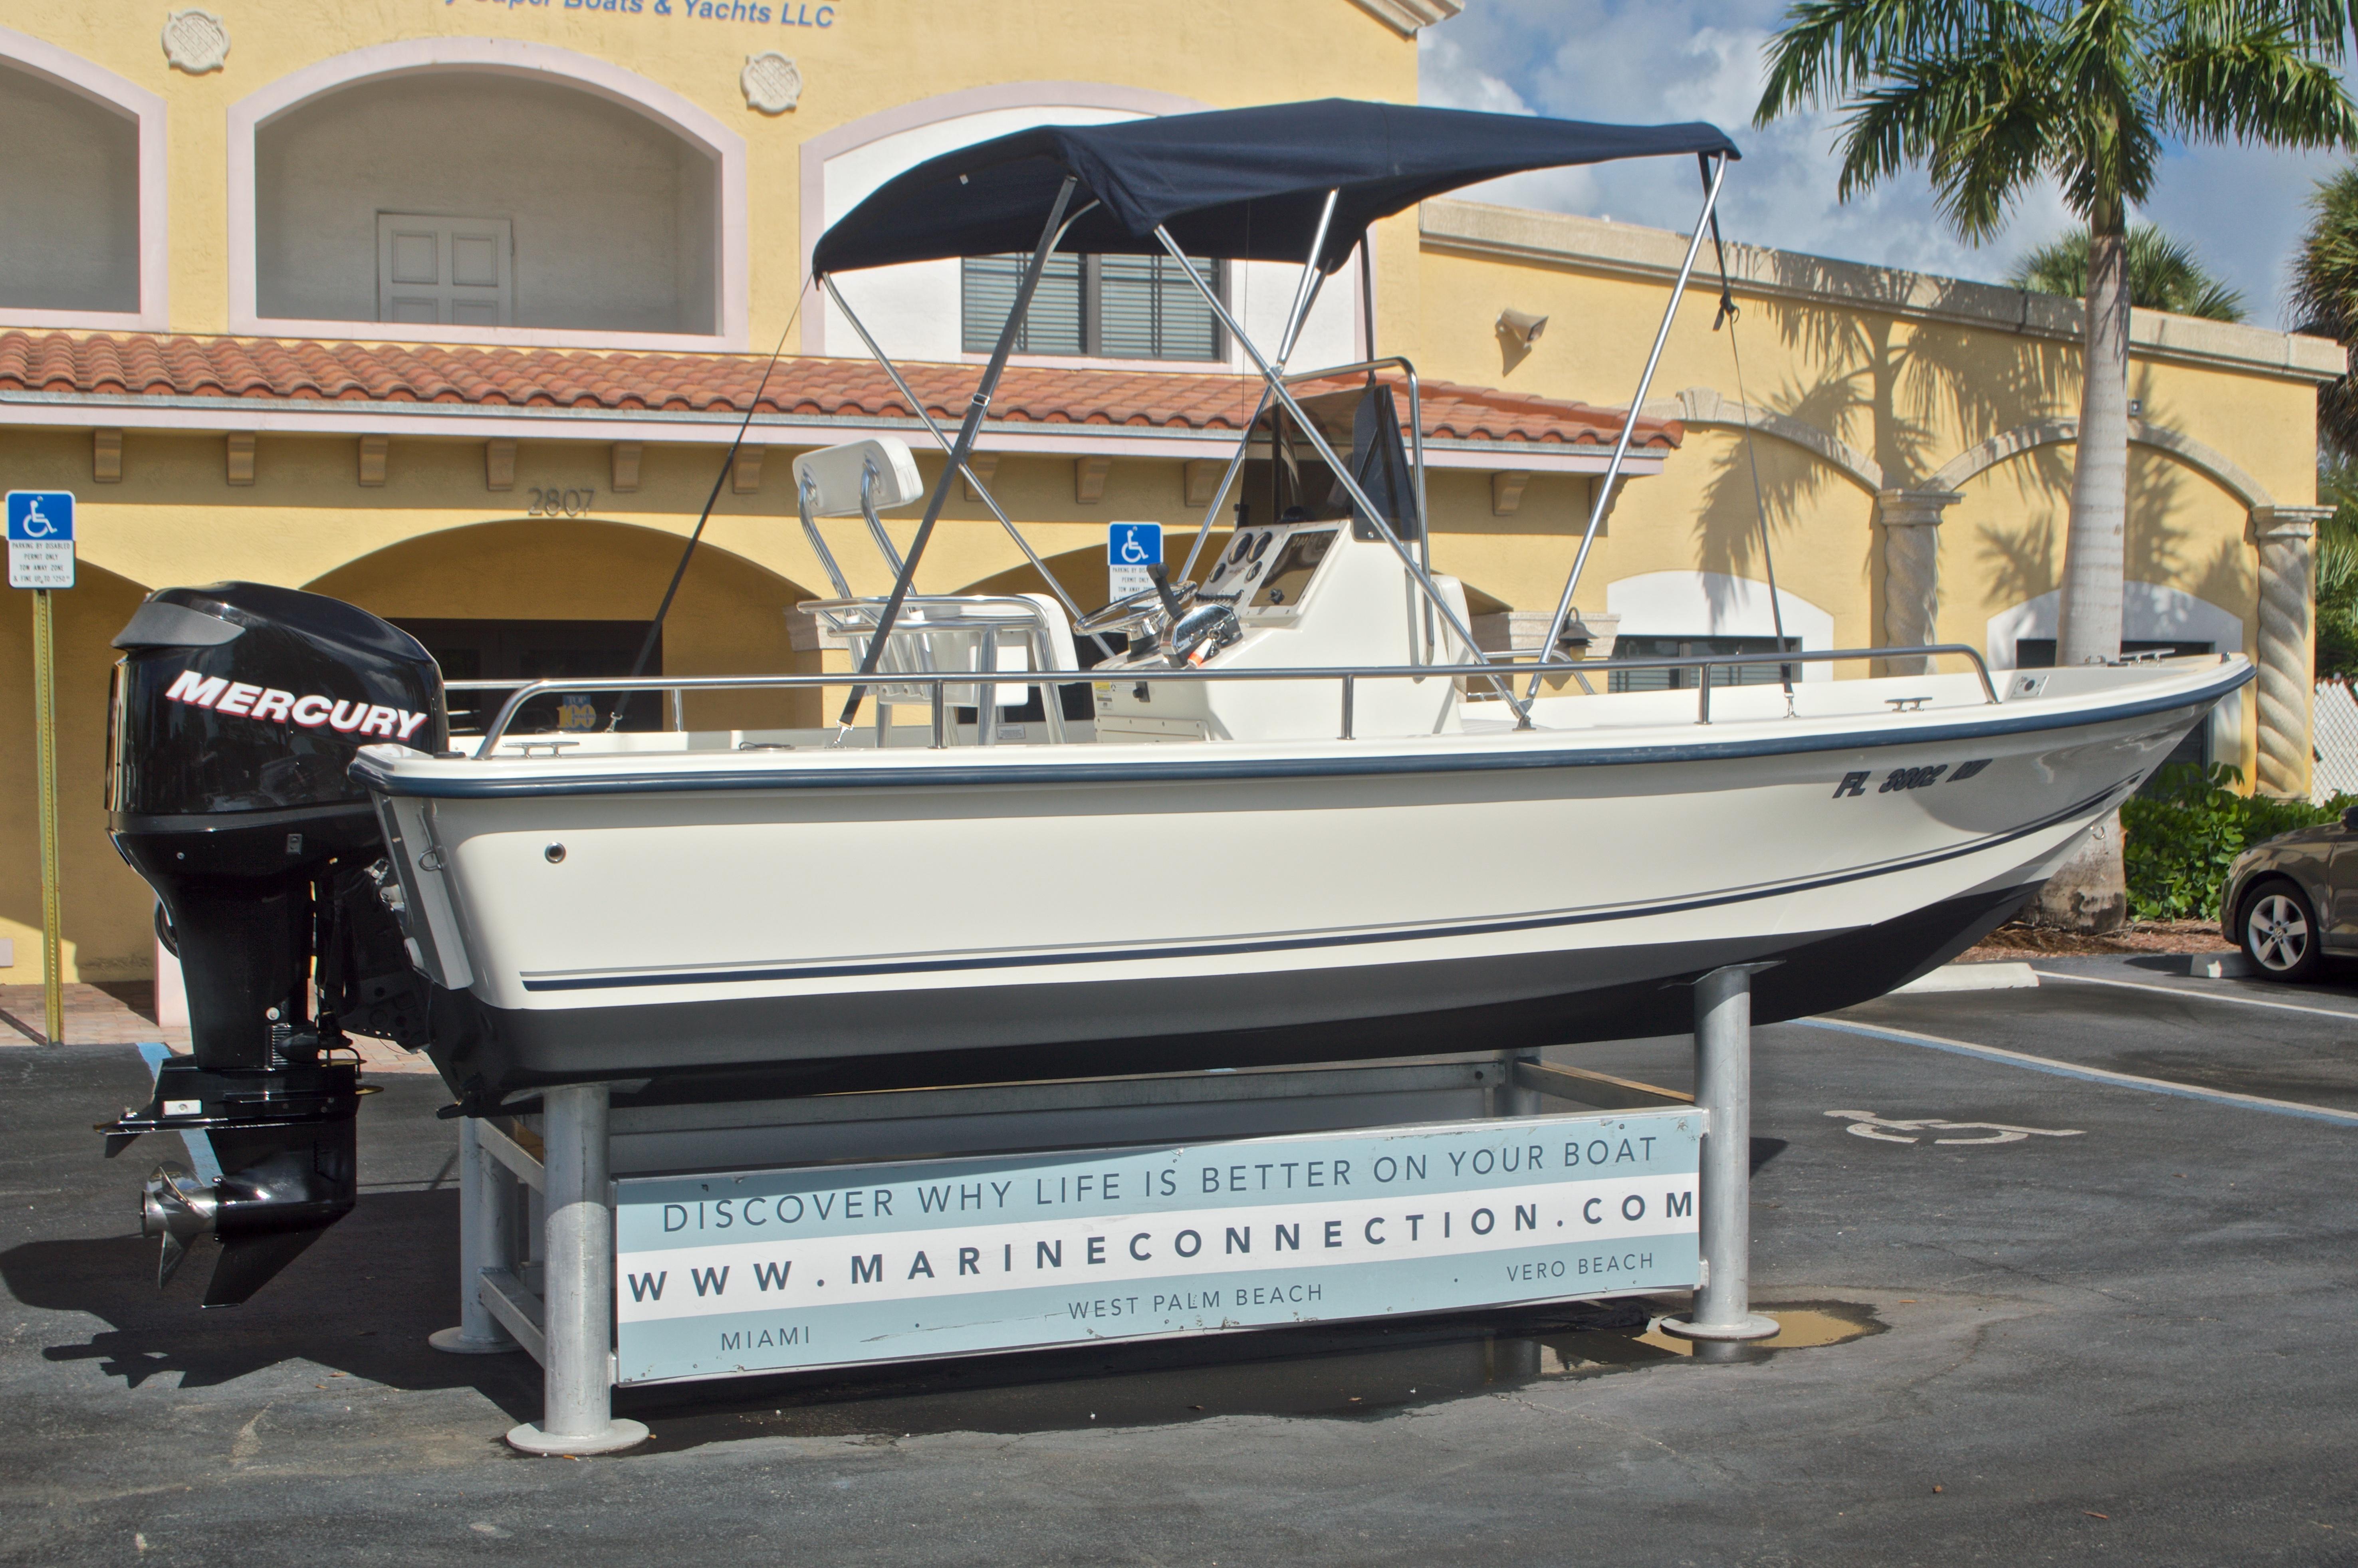 Used 2006 Sea Boss 190 Center Console Boat For Sale In